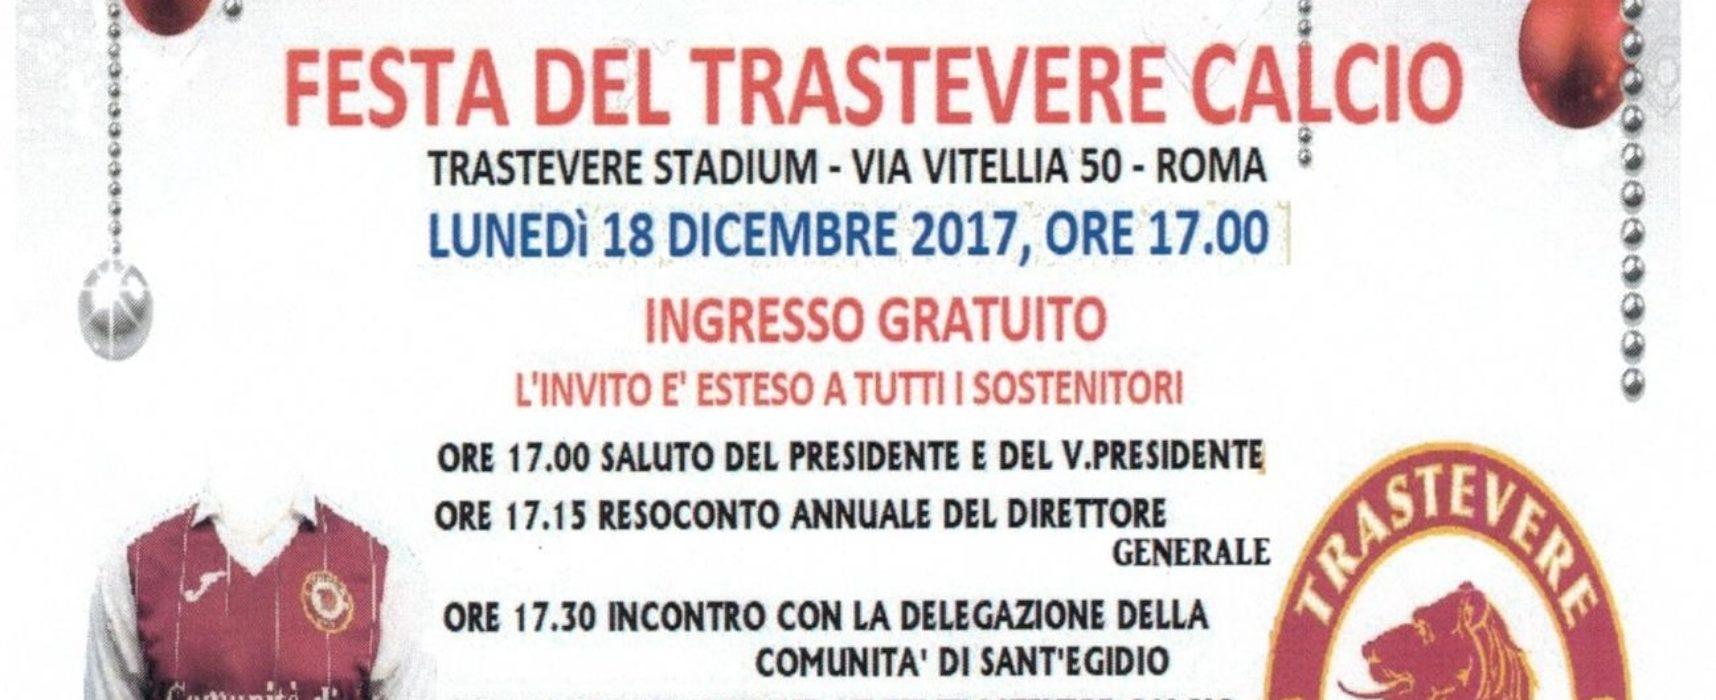 FESTA DI NATALE DEL TRASTEVERE CALCIO: OGGI ALLE 17.00 AL TRASTEVERE STADIUM